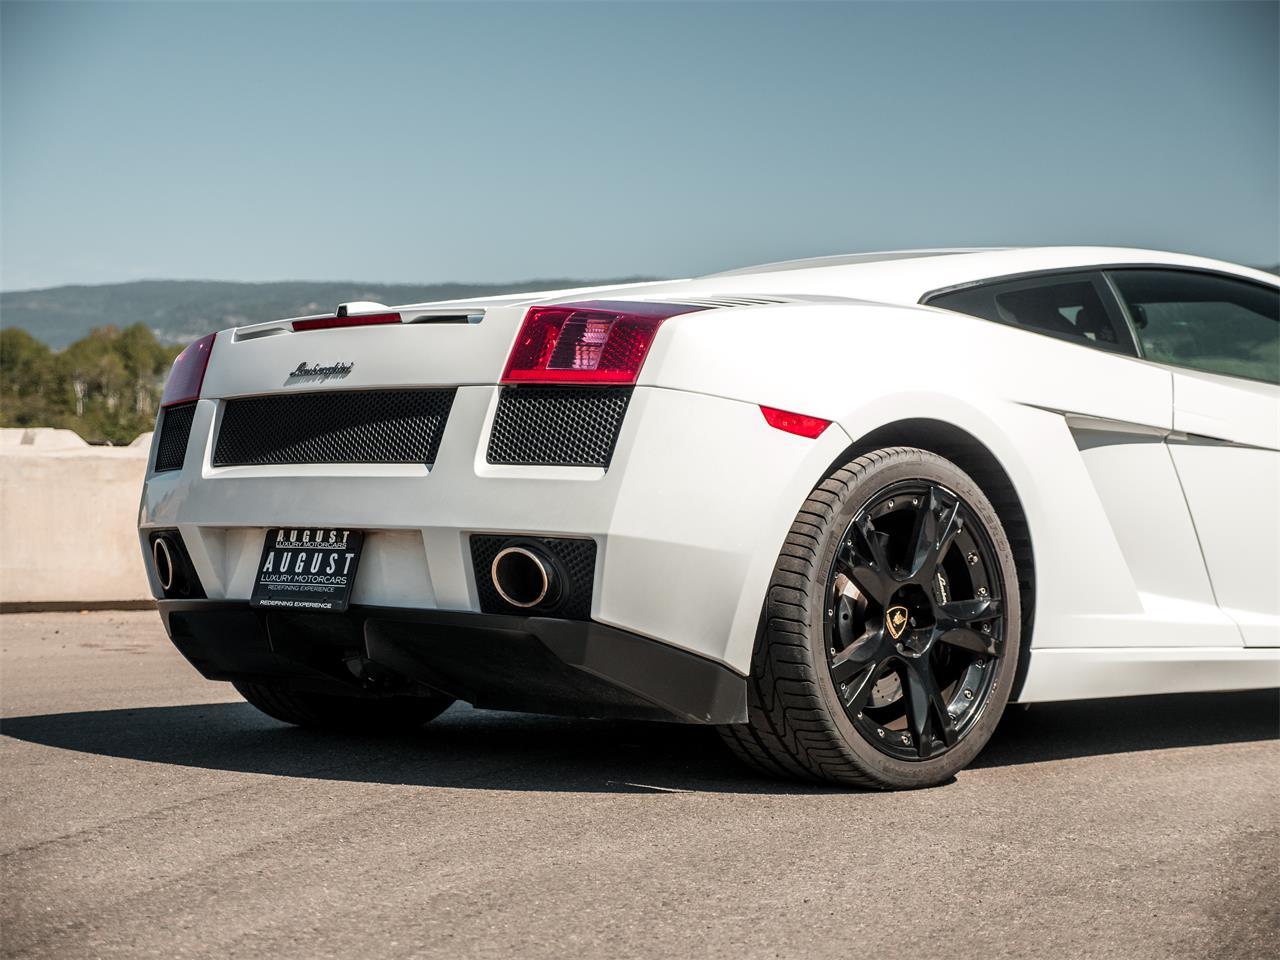 Large Picture of '08 Lamborghini Gallardo Offered by ABC Dealer TEST - QUI2